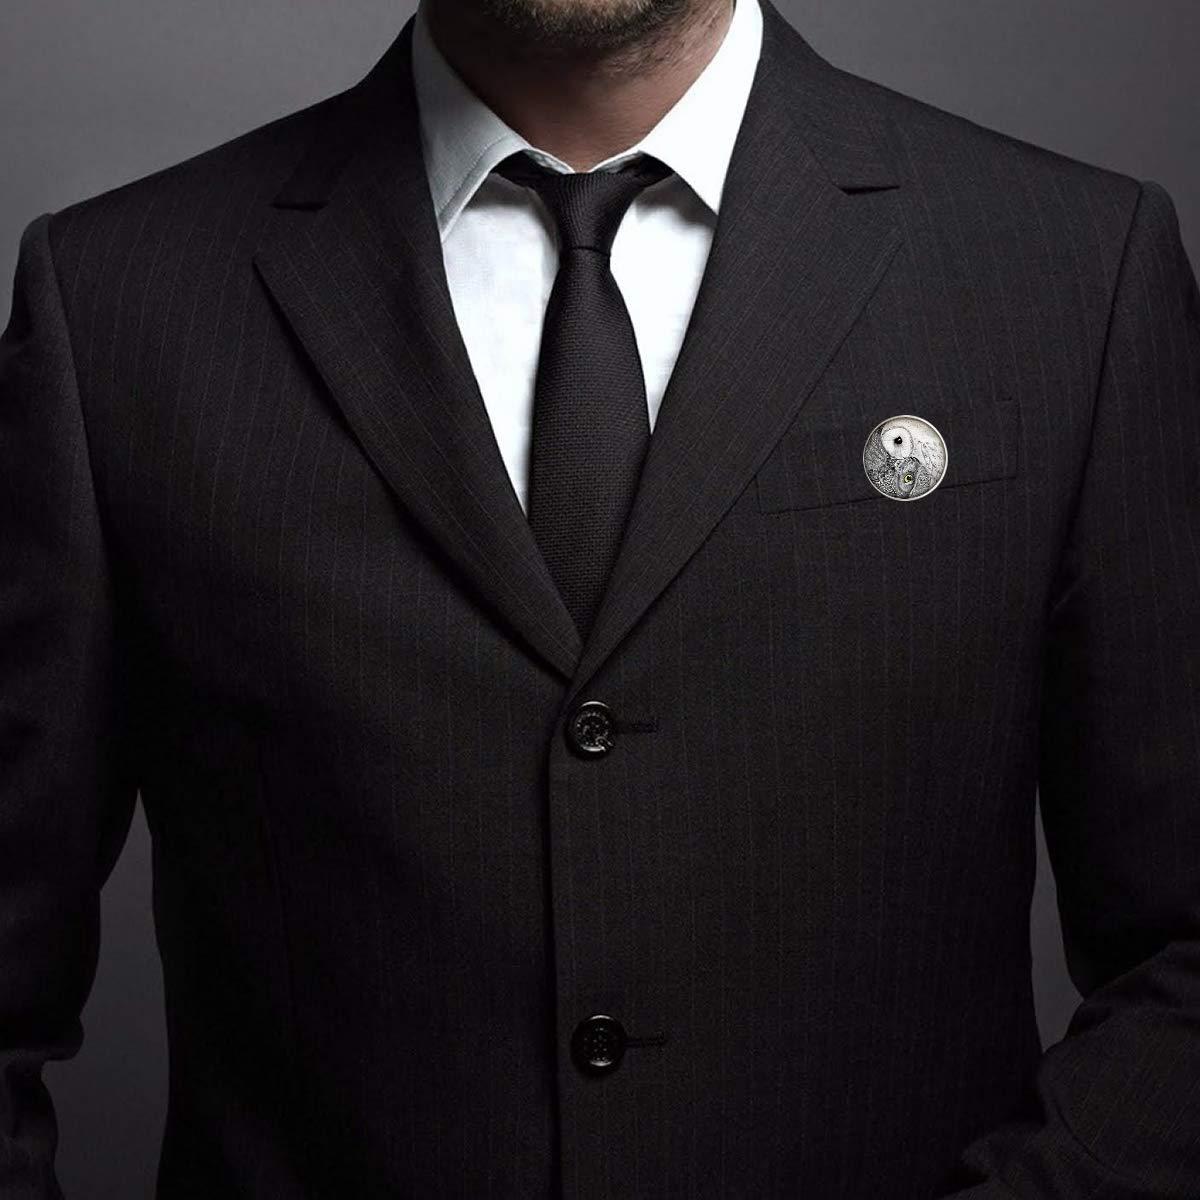 Pinback Buttons Badges Pins Eagle Tiger Lapel Pin Brooch Clip Trendy Accessory Jacket T-Shirt Bag Hat Shoe